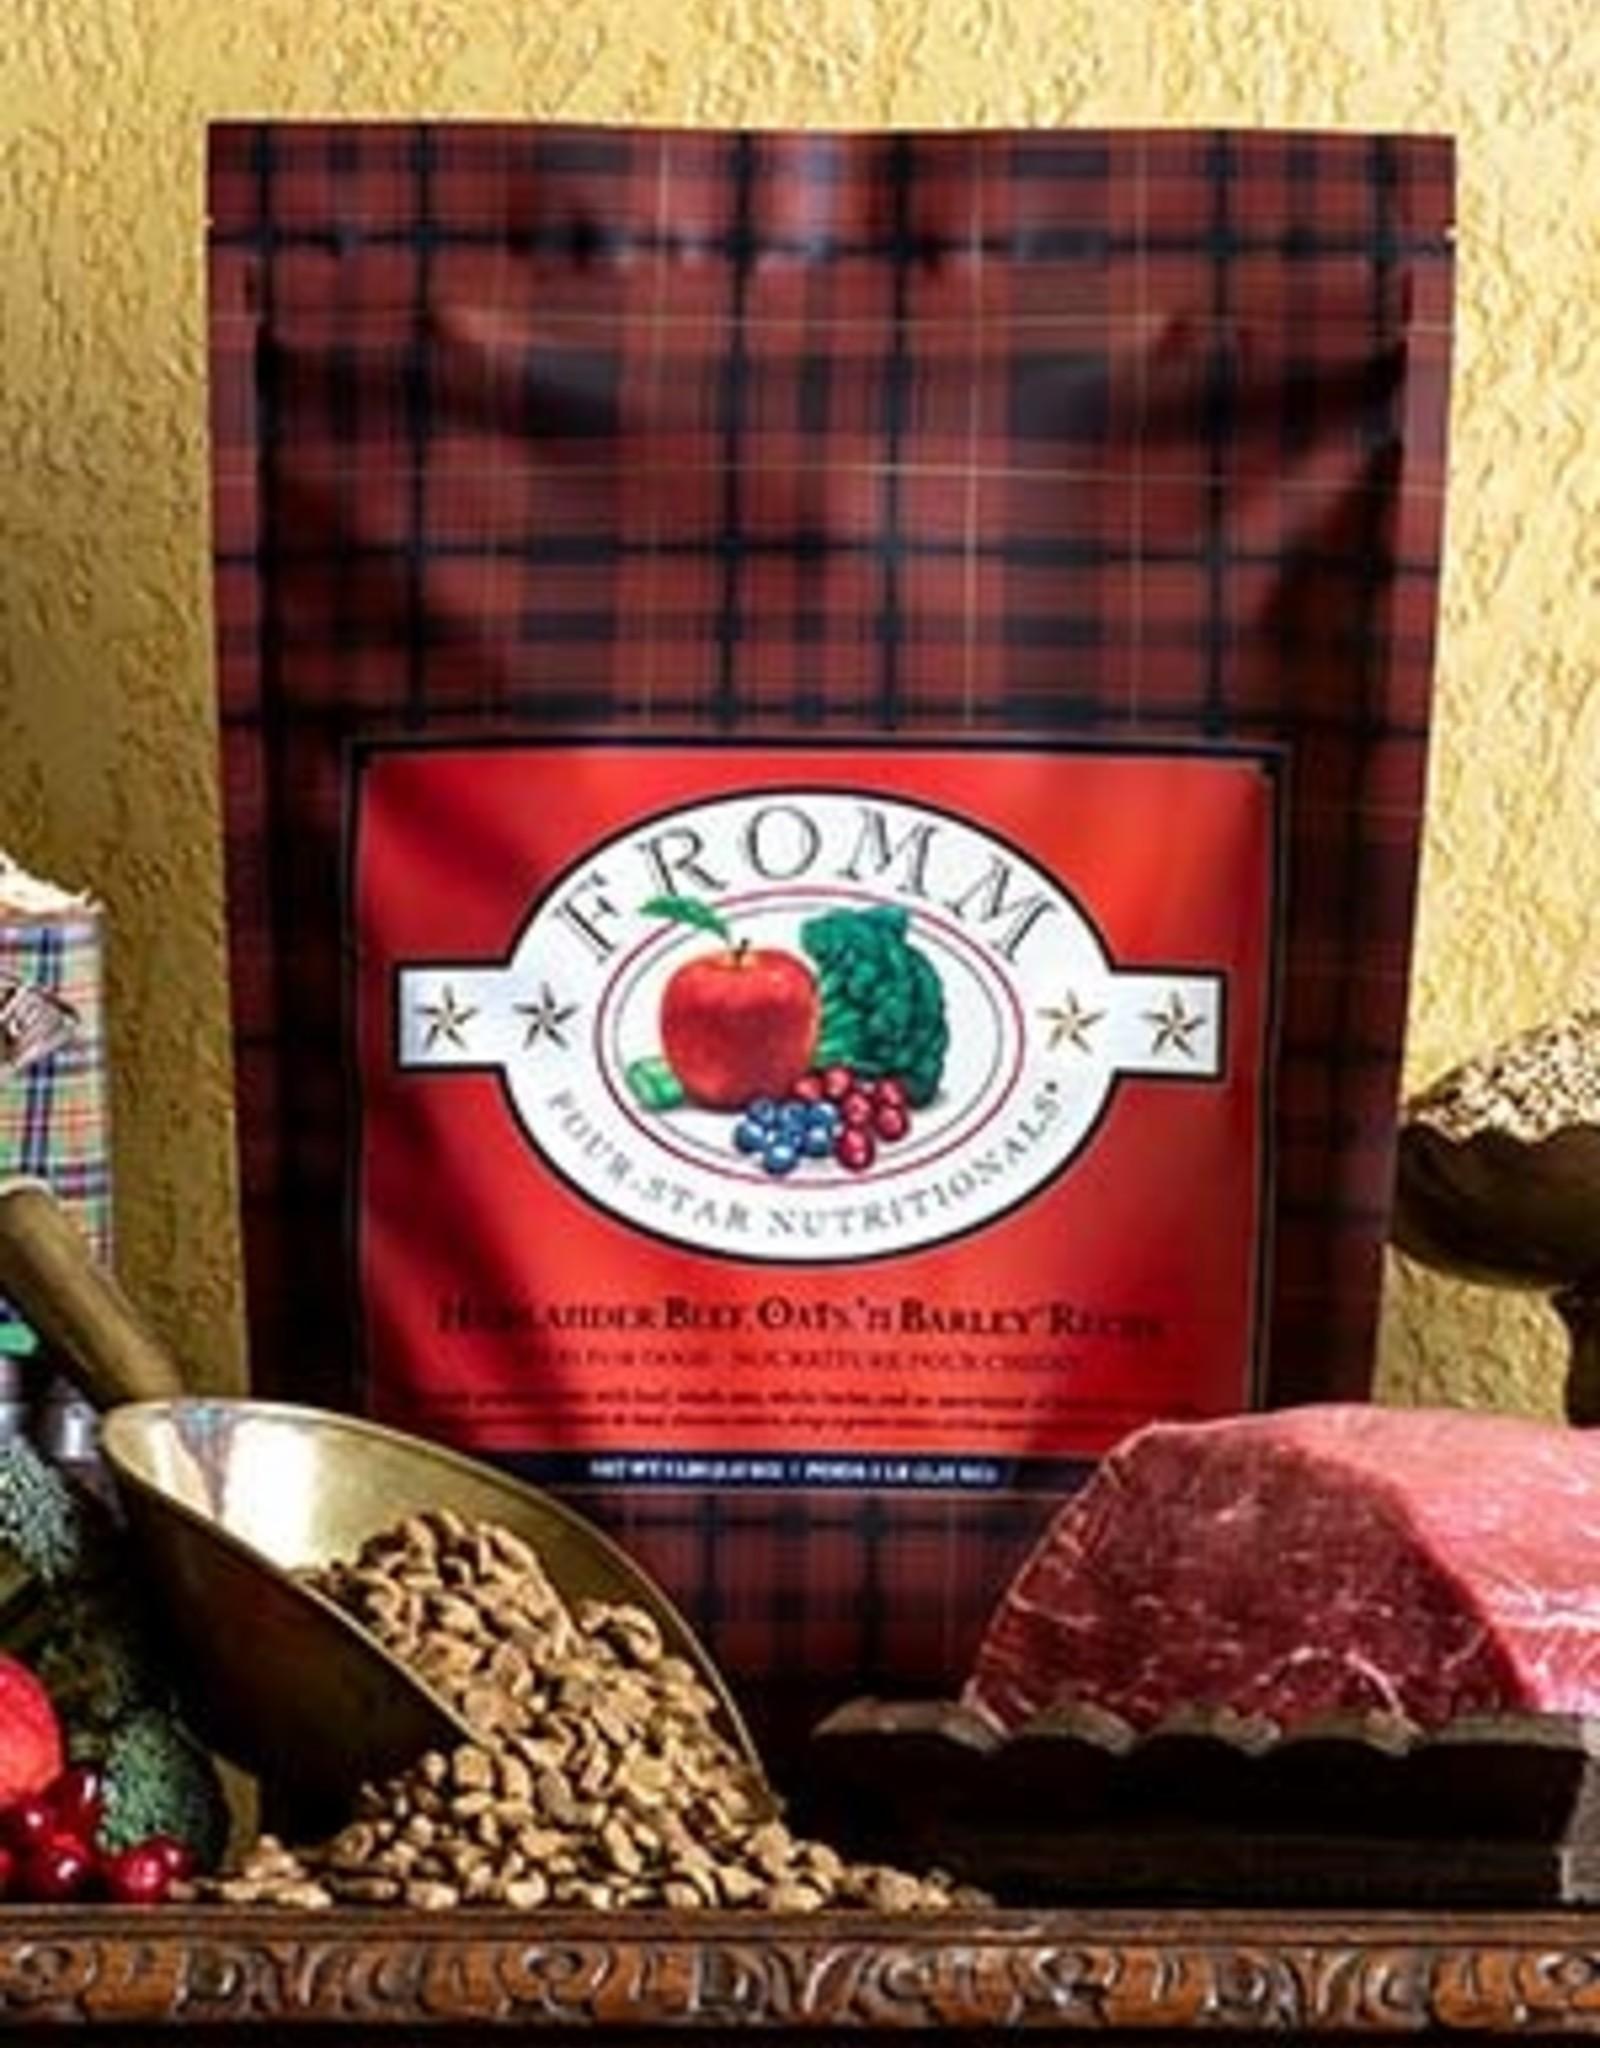 Fromm Family Pet Foods Dog Highlander Beef, Oats, 'n Barley® Recipe - Whole Grain 5lb